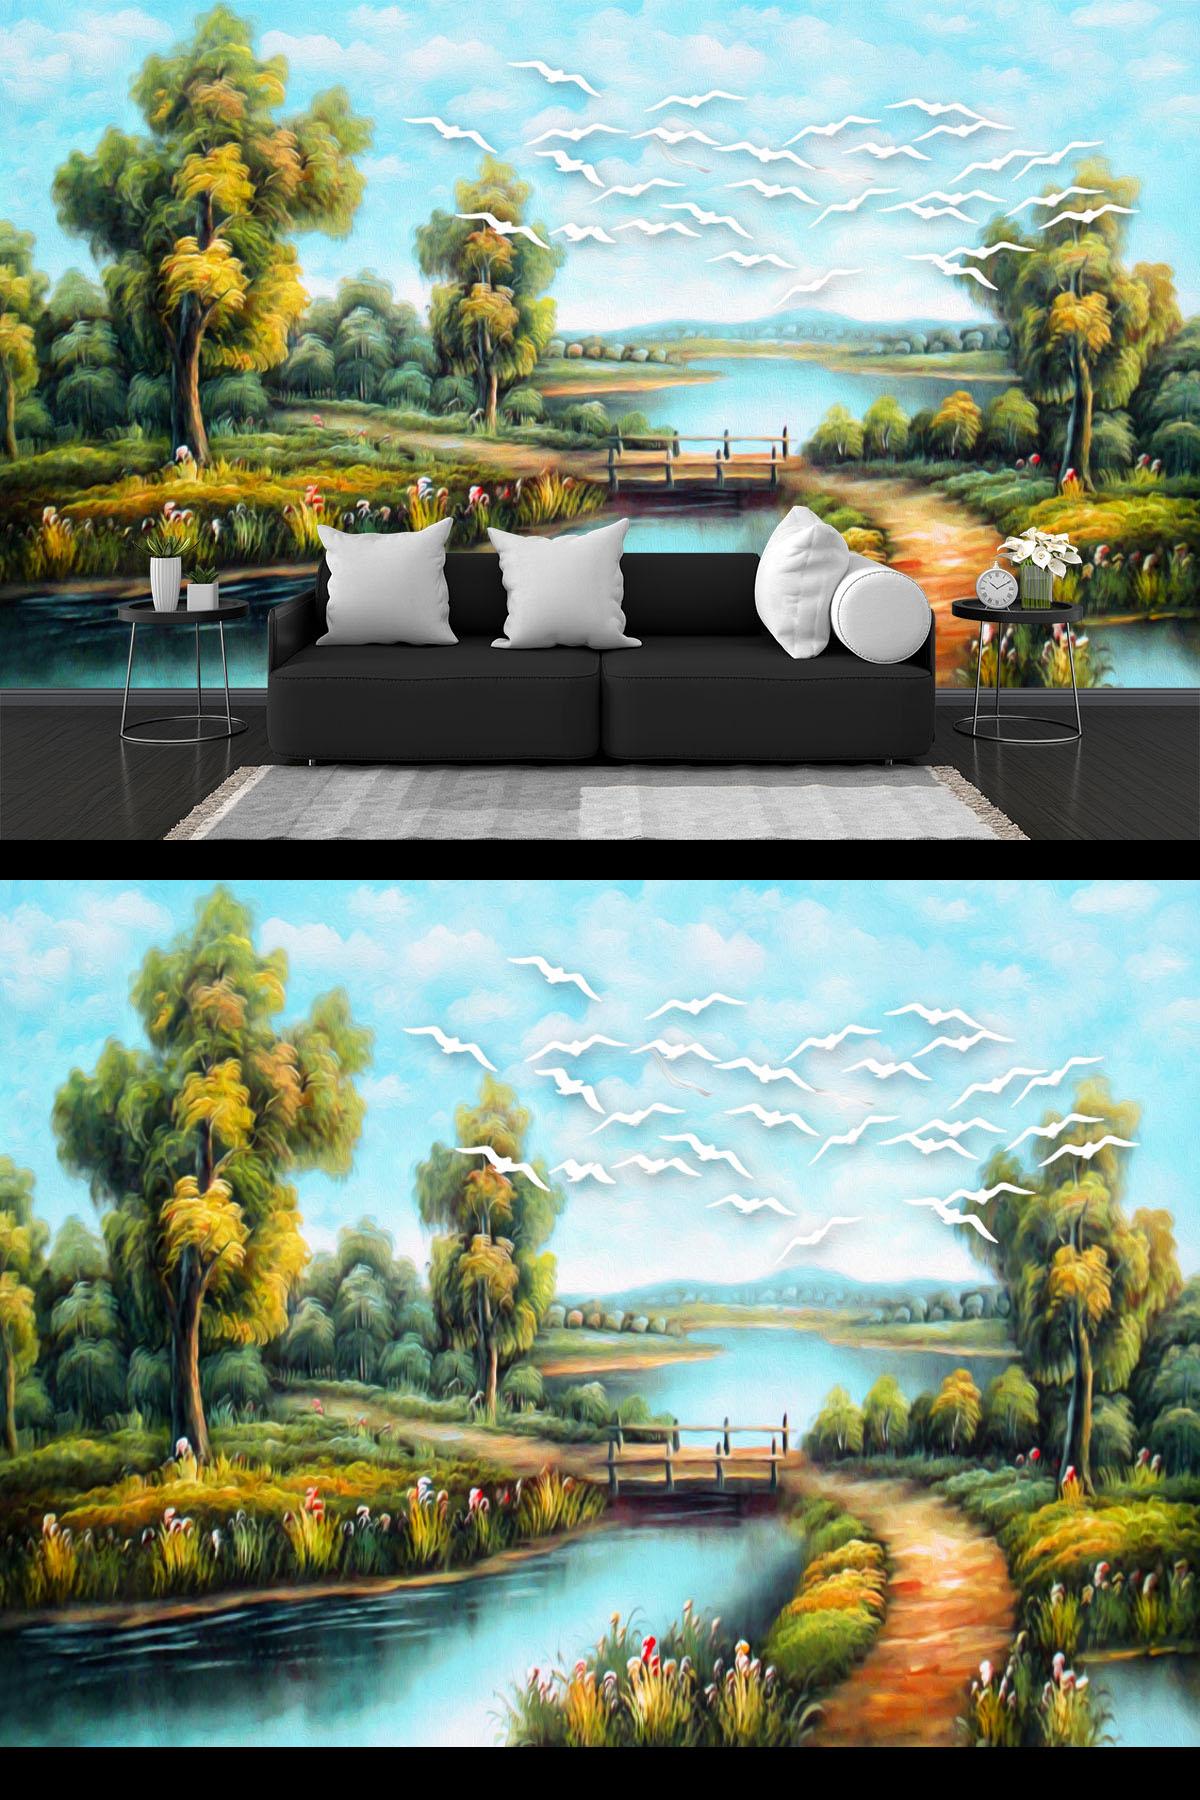 Mẫu tranh tường sơn thuỷ